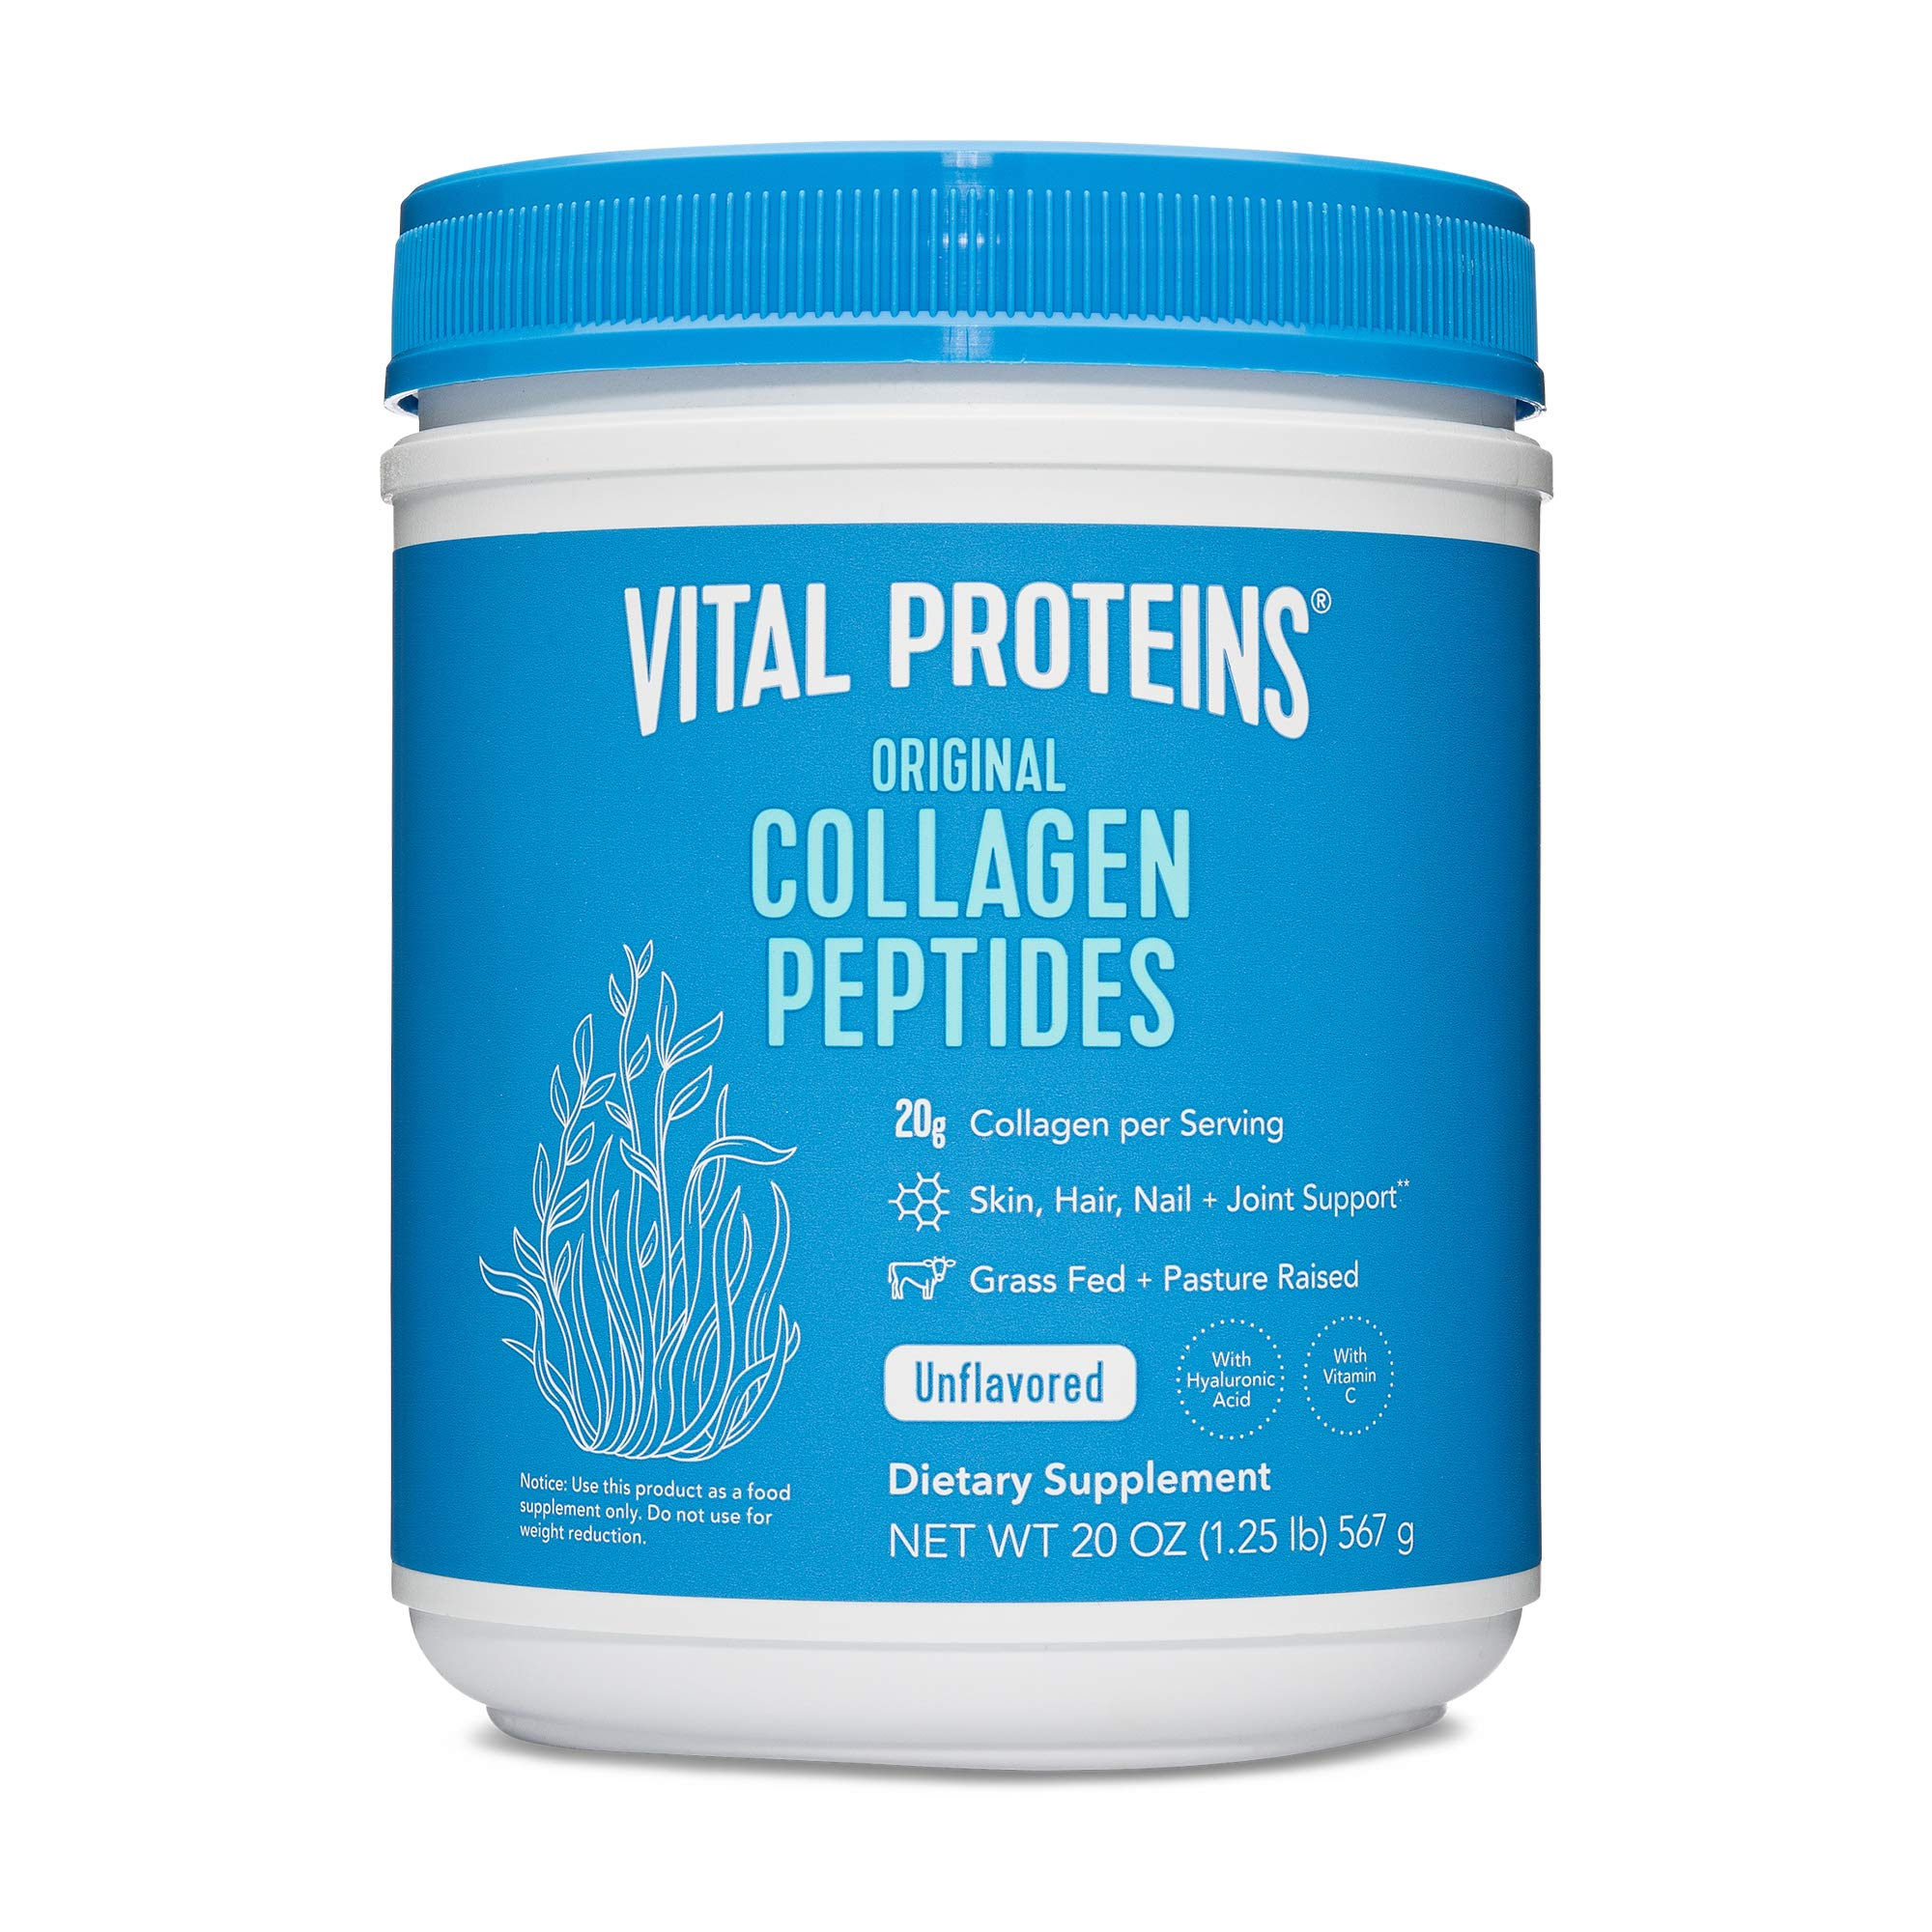 Vital Proteins Collagen Peptides Powder - Pasture Raised, Grass Fed, unflavored 20 oz